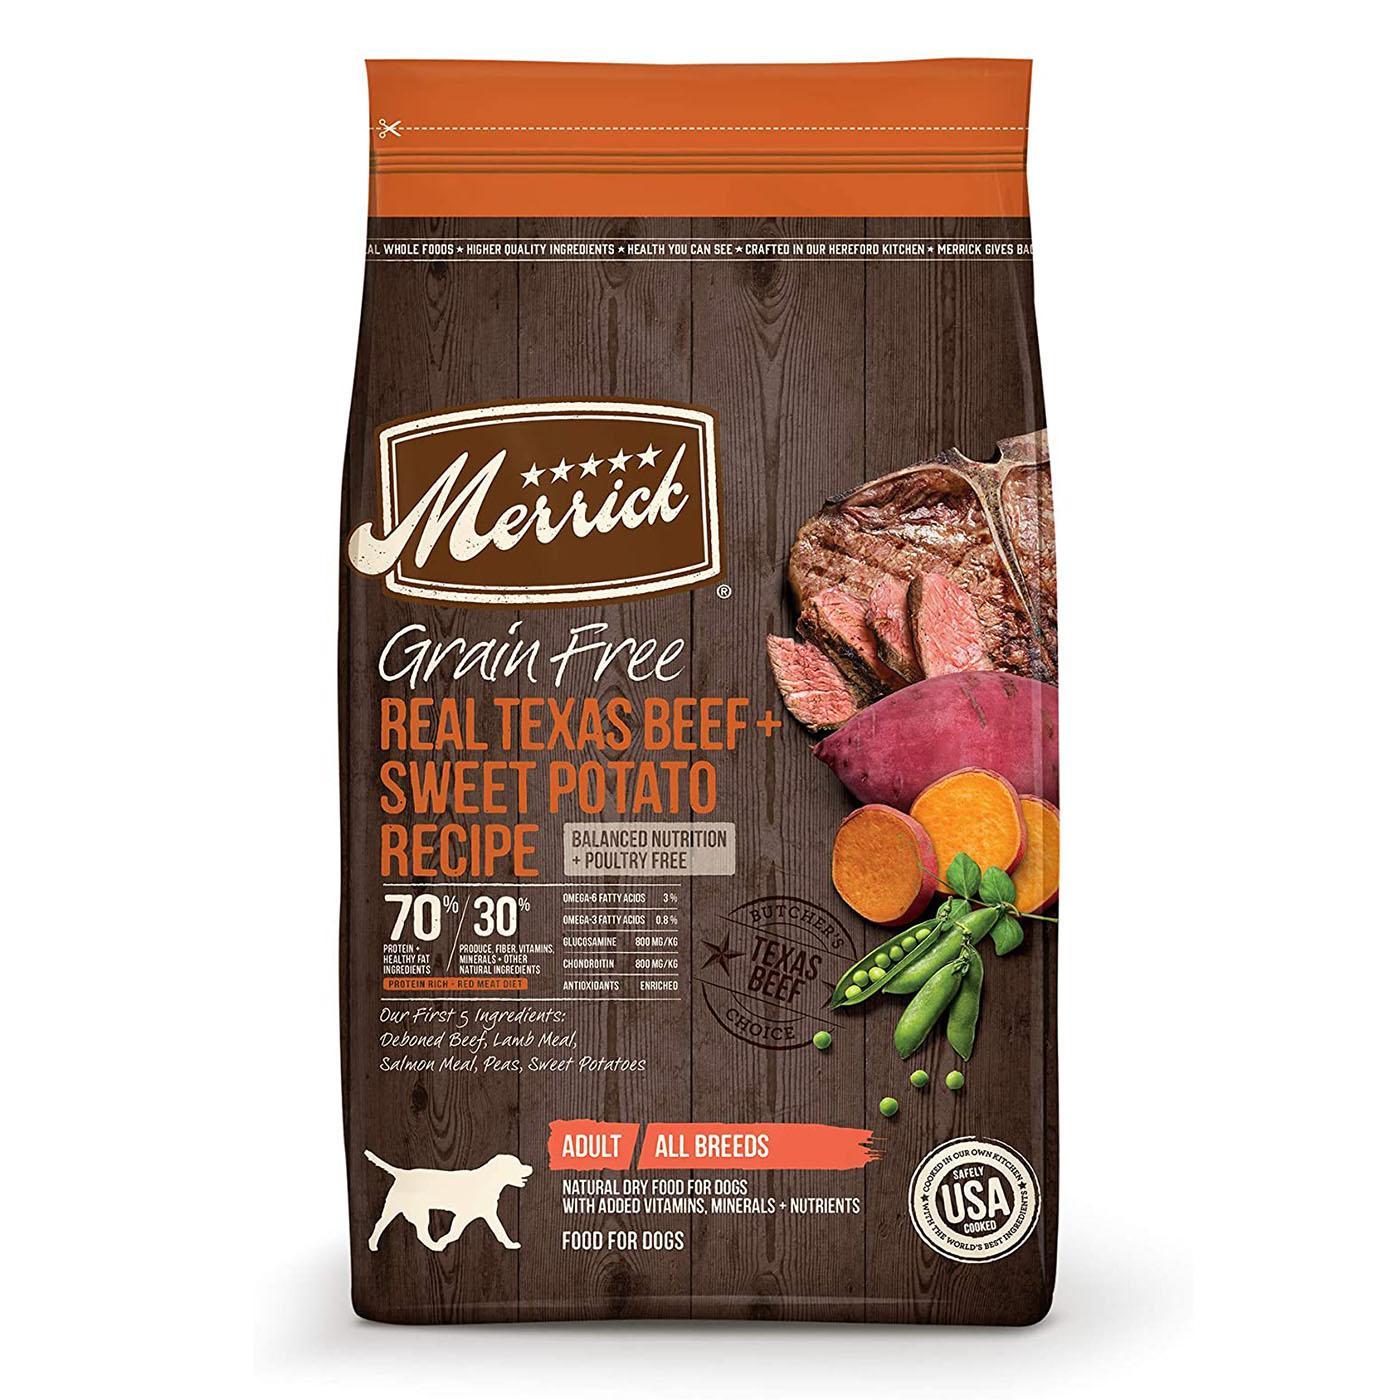 Merrick Grain-Free Dry Dog Food - Real Texas Beef & Sweet Potato Recipe